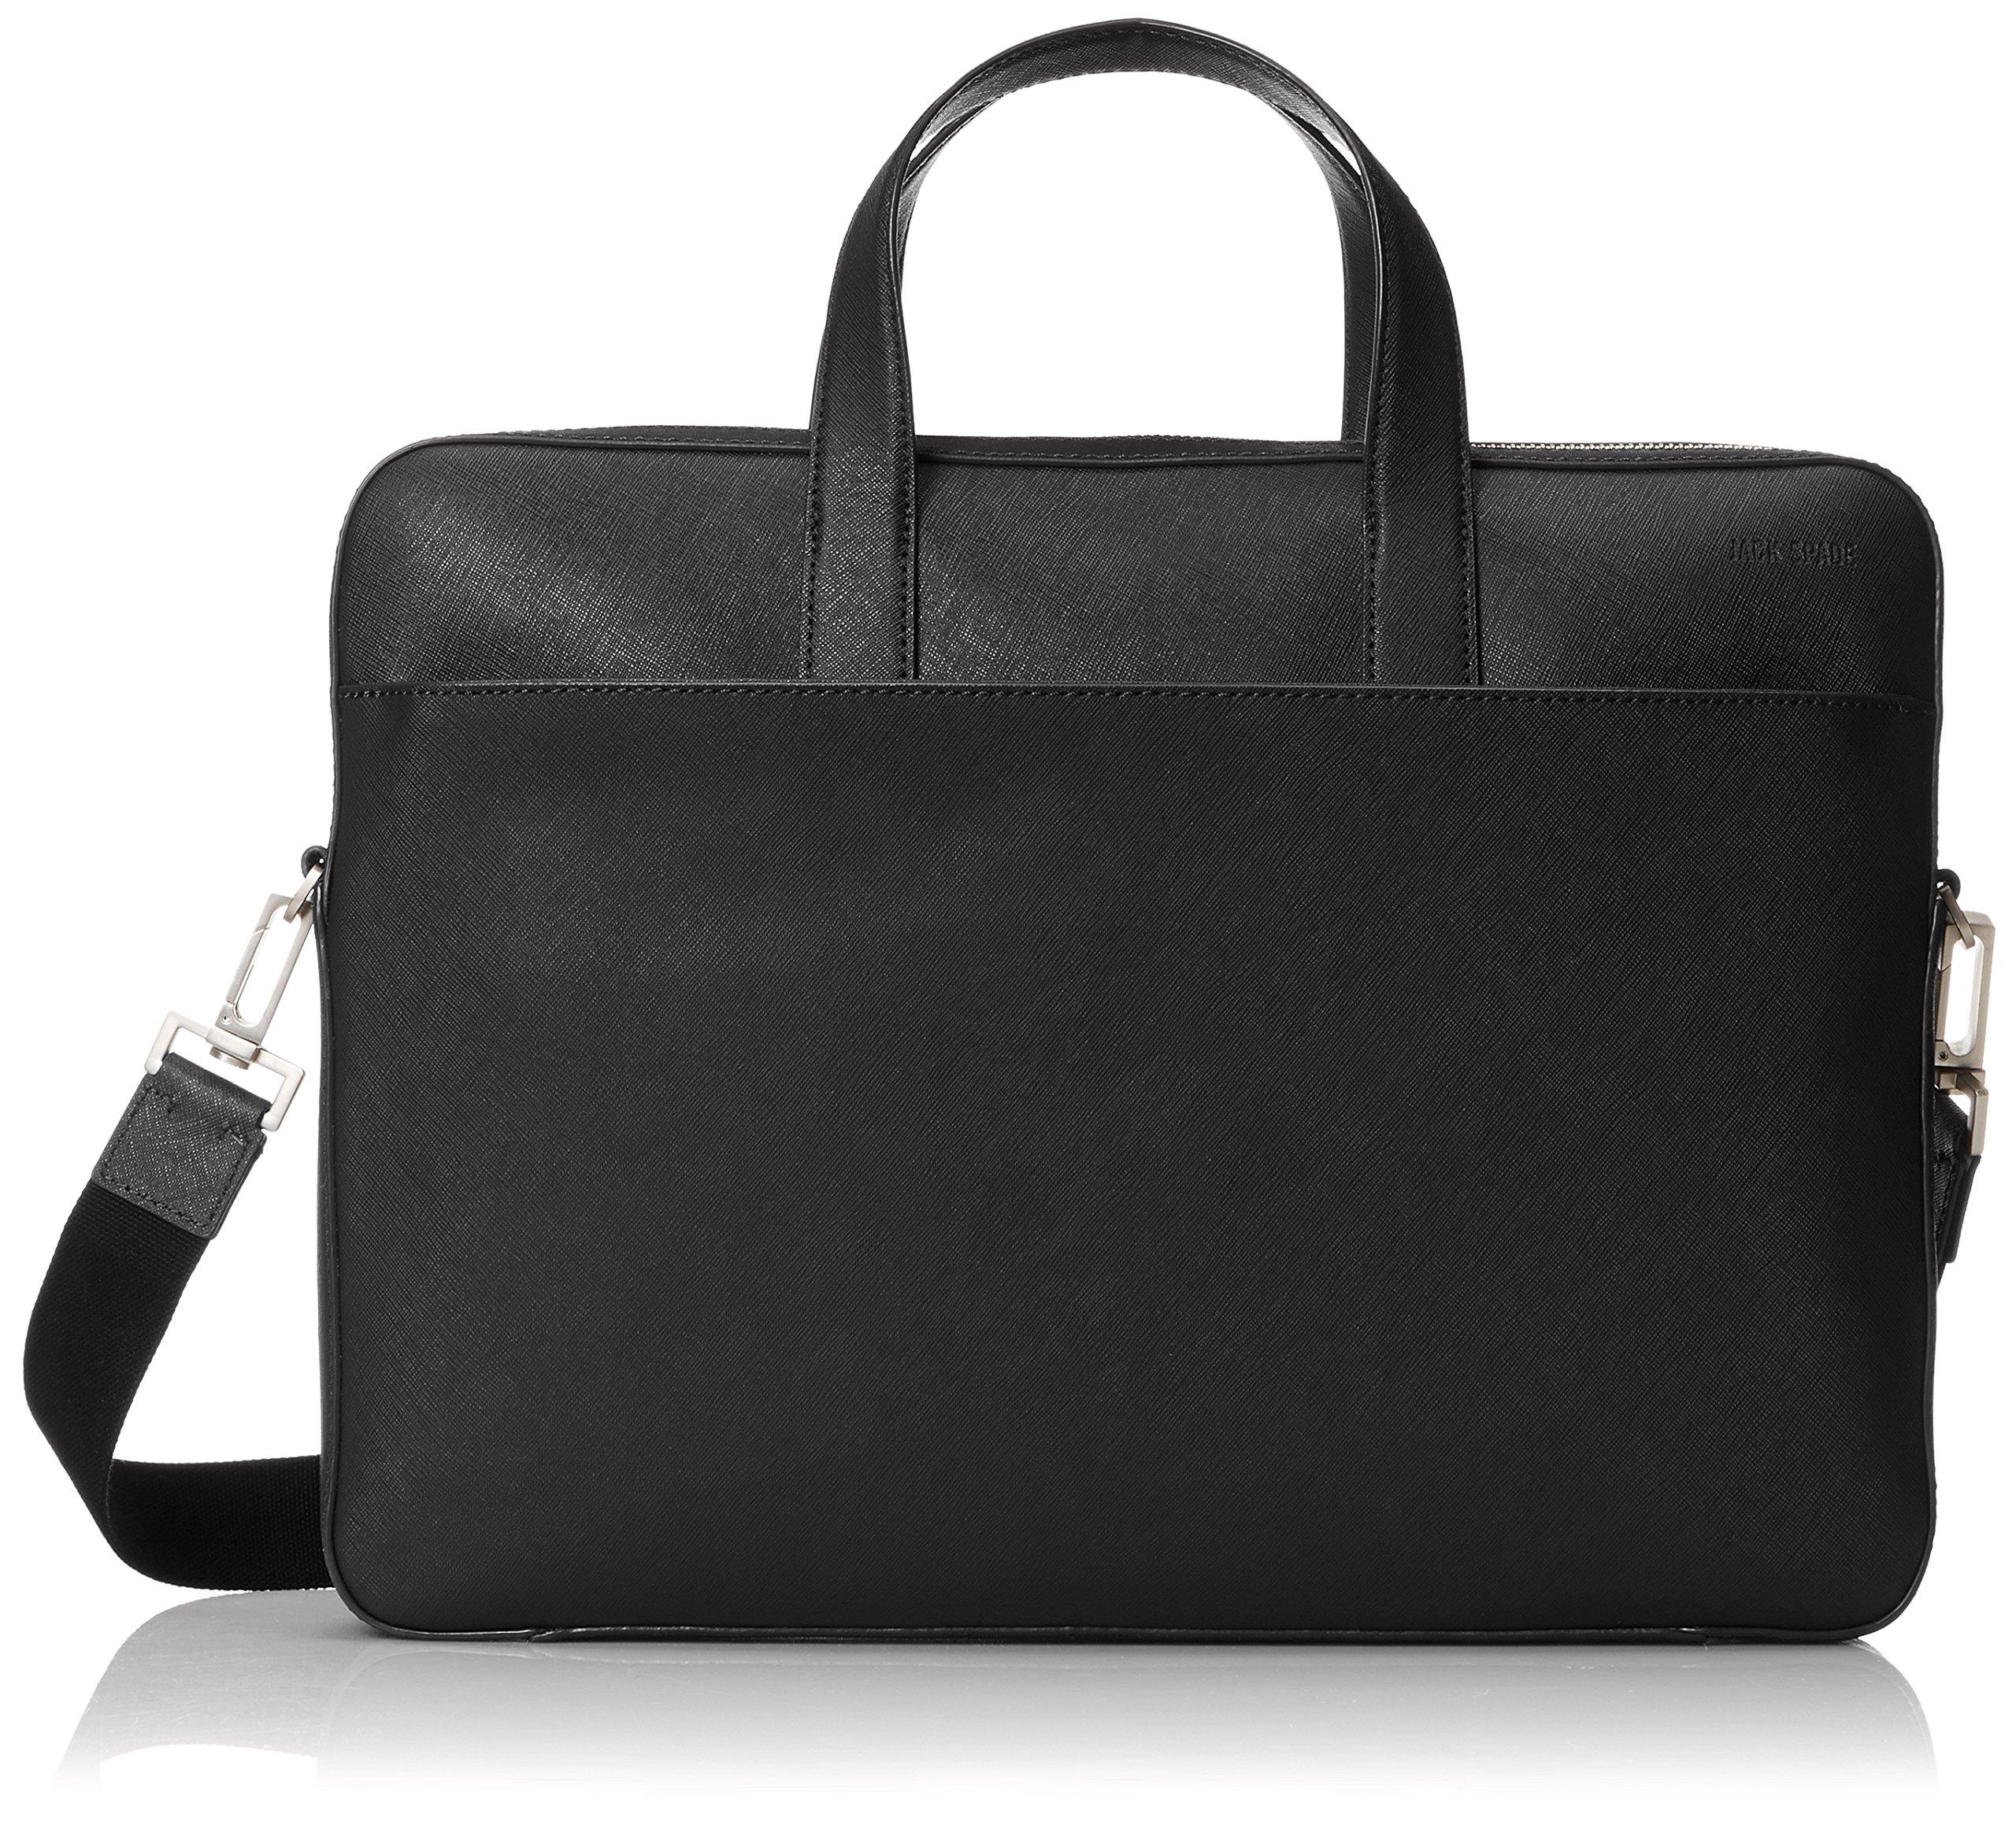 Jack Spade Men's Barrow Leather Slim Brief, Black, One Size